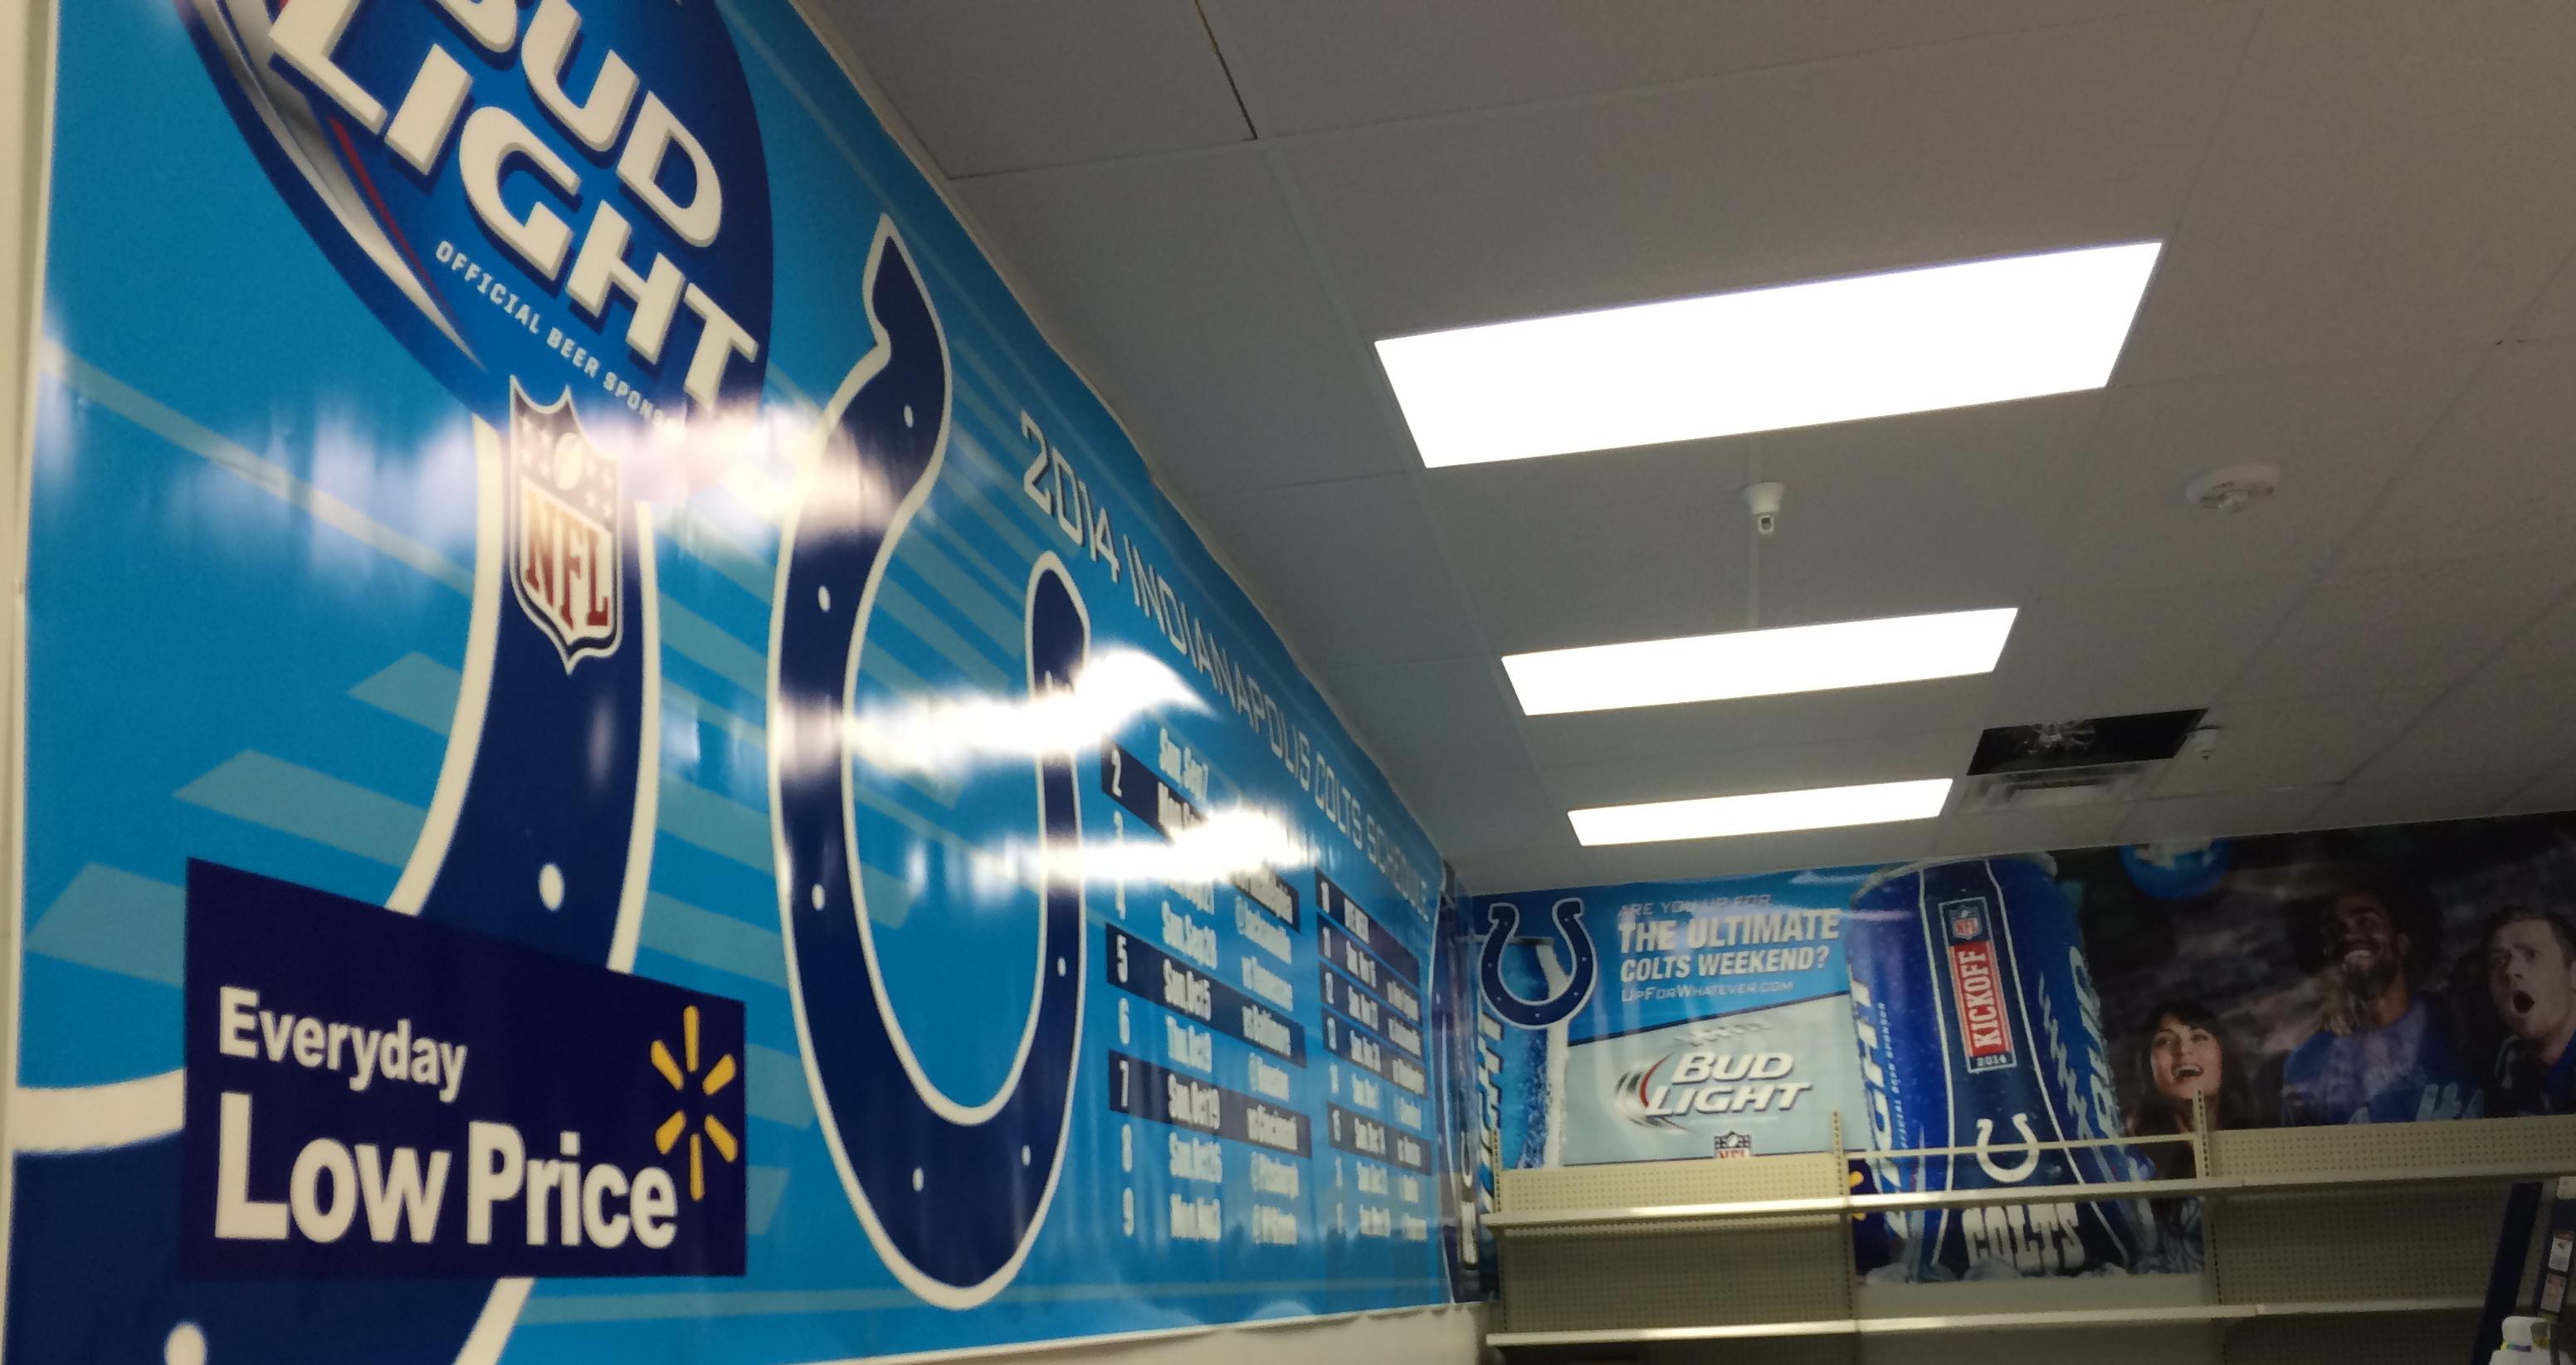 Walmart Colts Posters